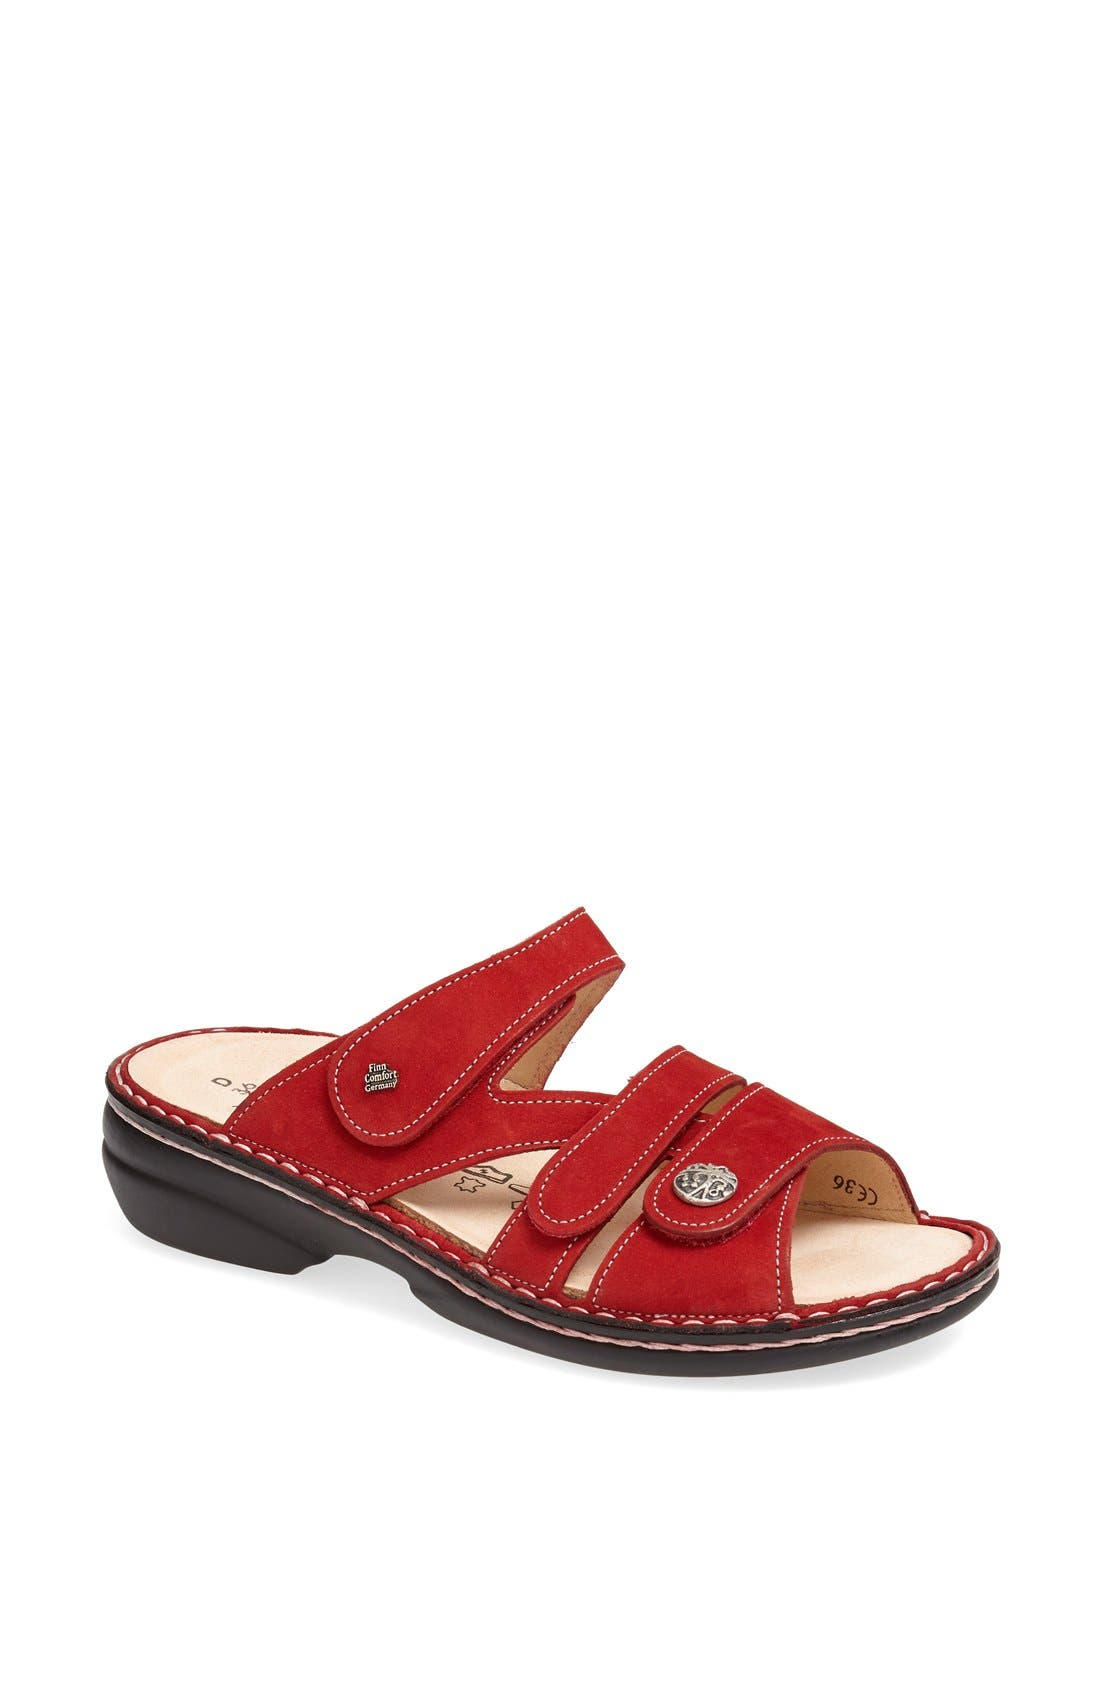 'Ventura' Sandal,                             Main thumbnail 1, color,                             RED